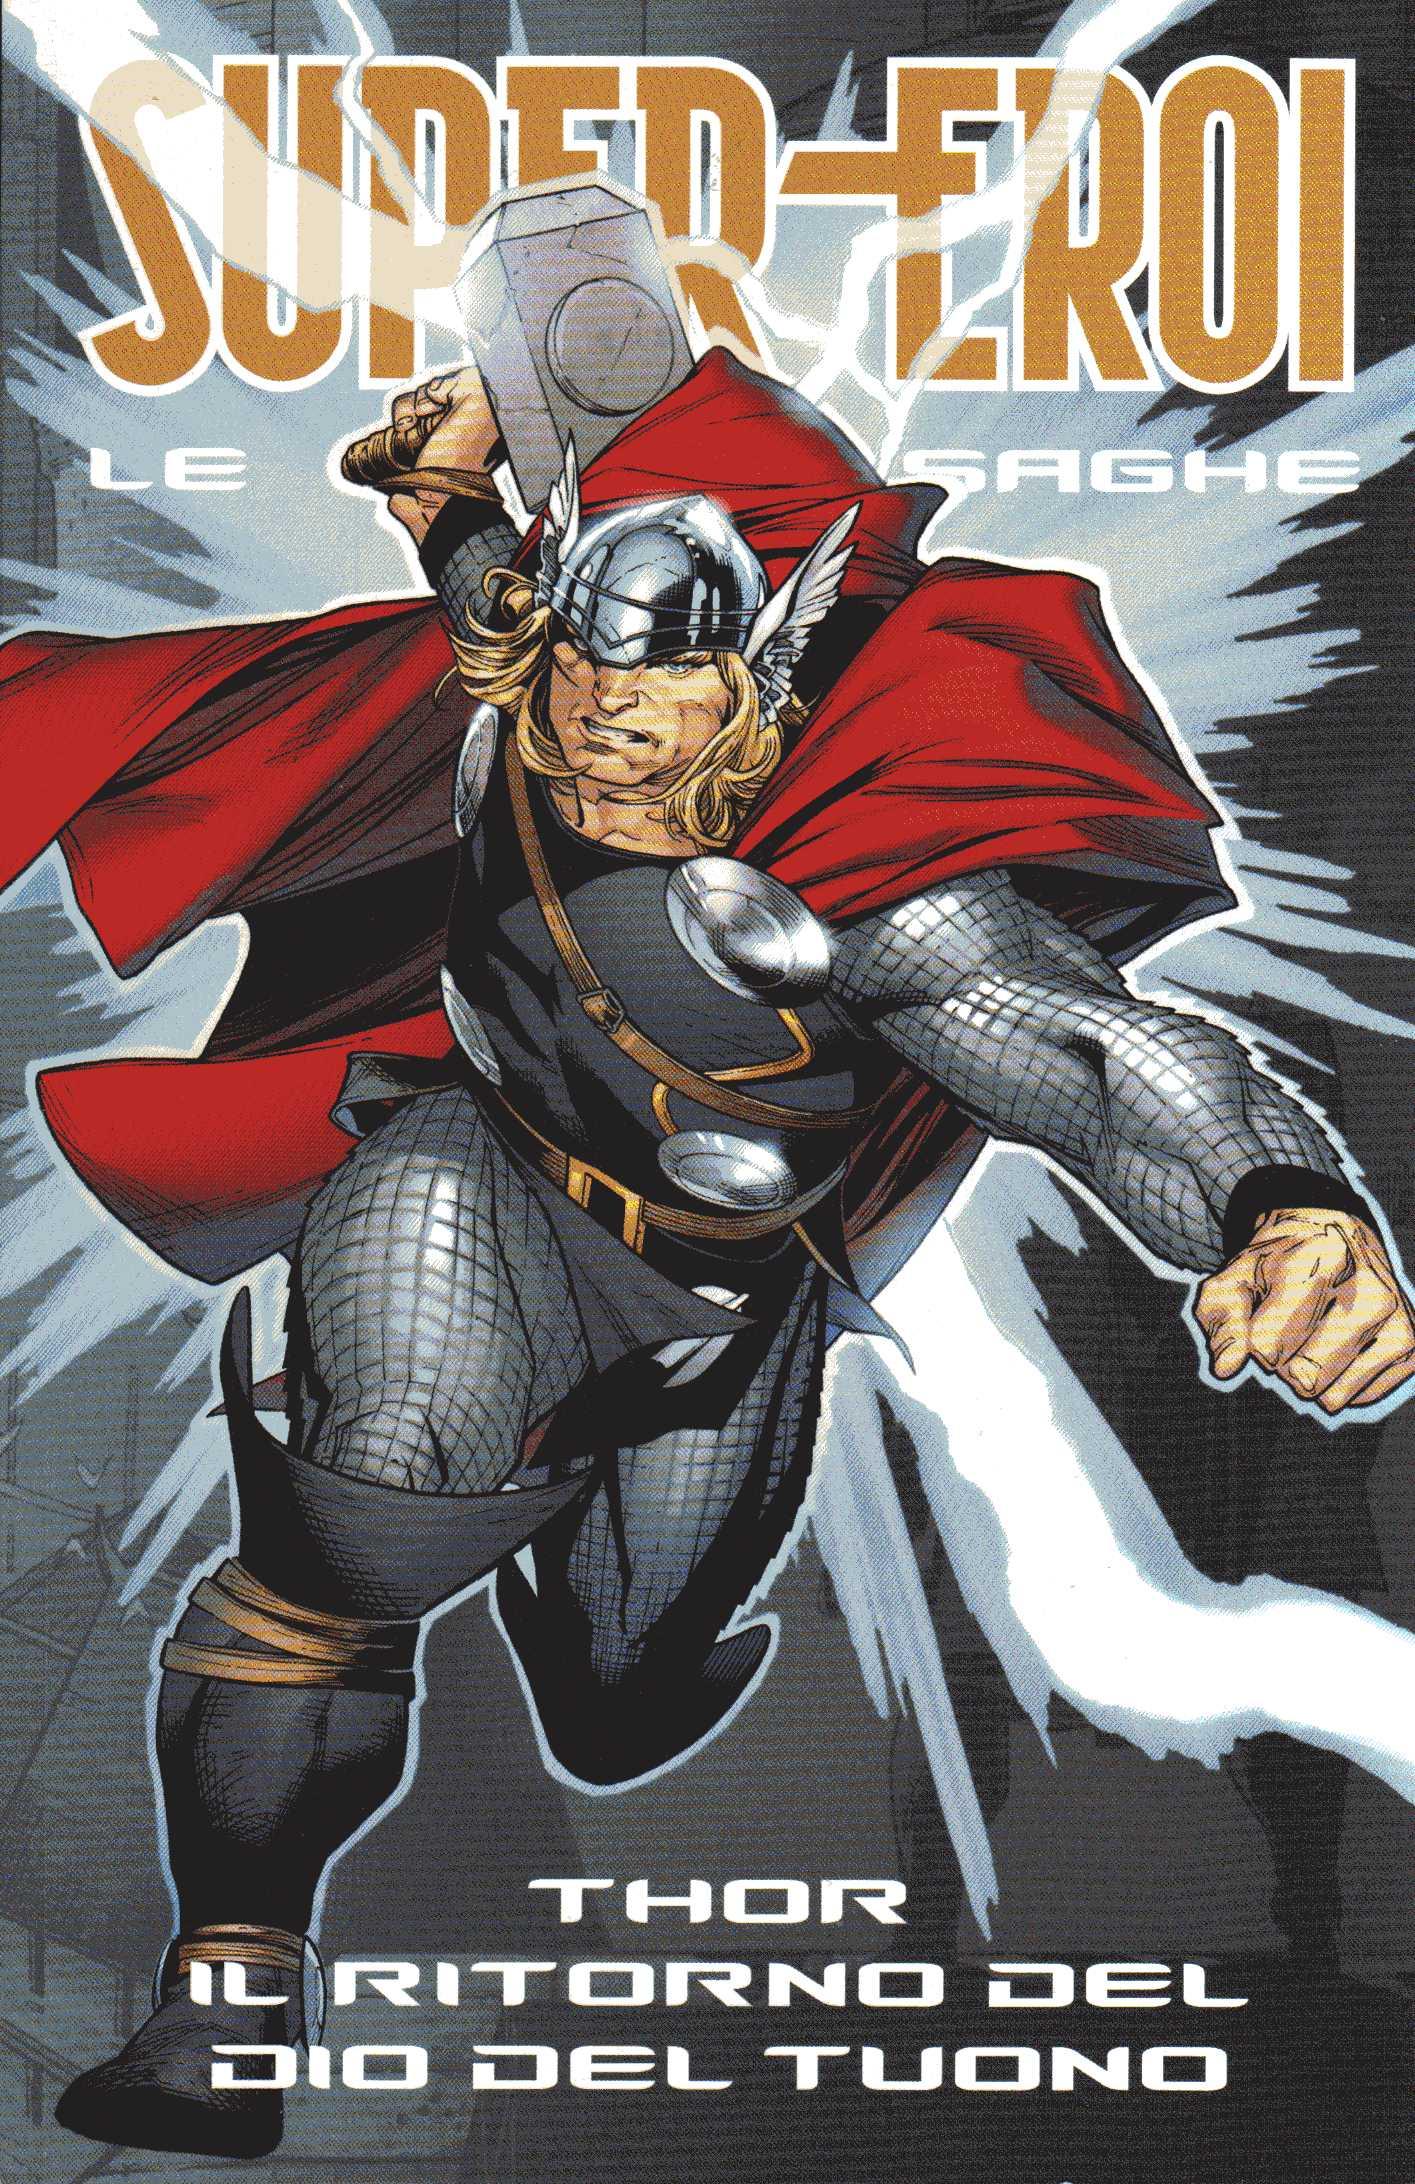 Supereroi - Le grandi saghe vol. 16